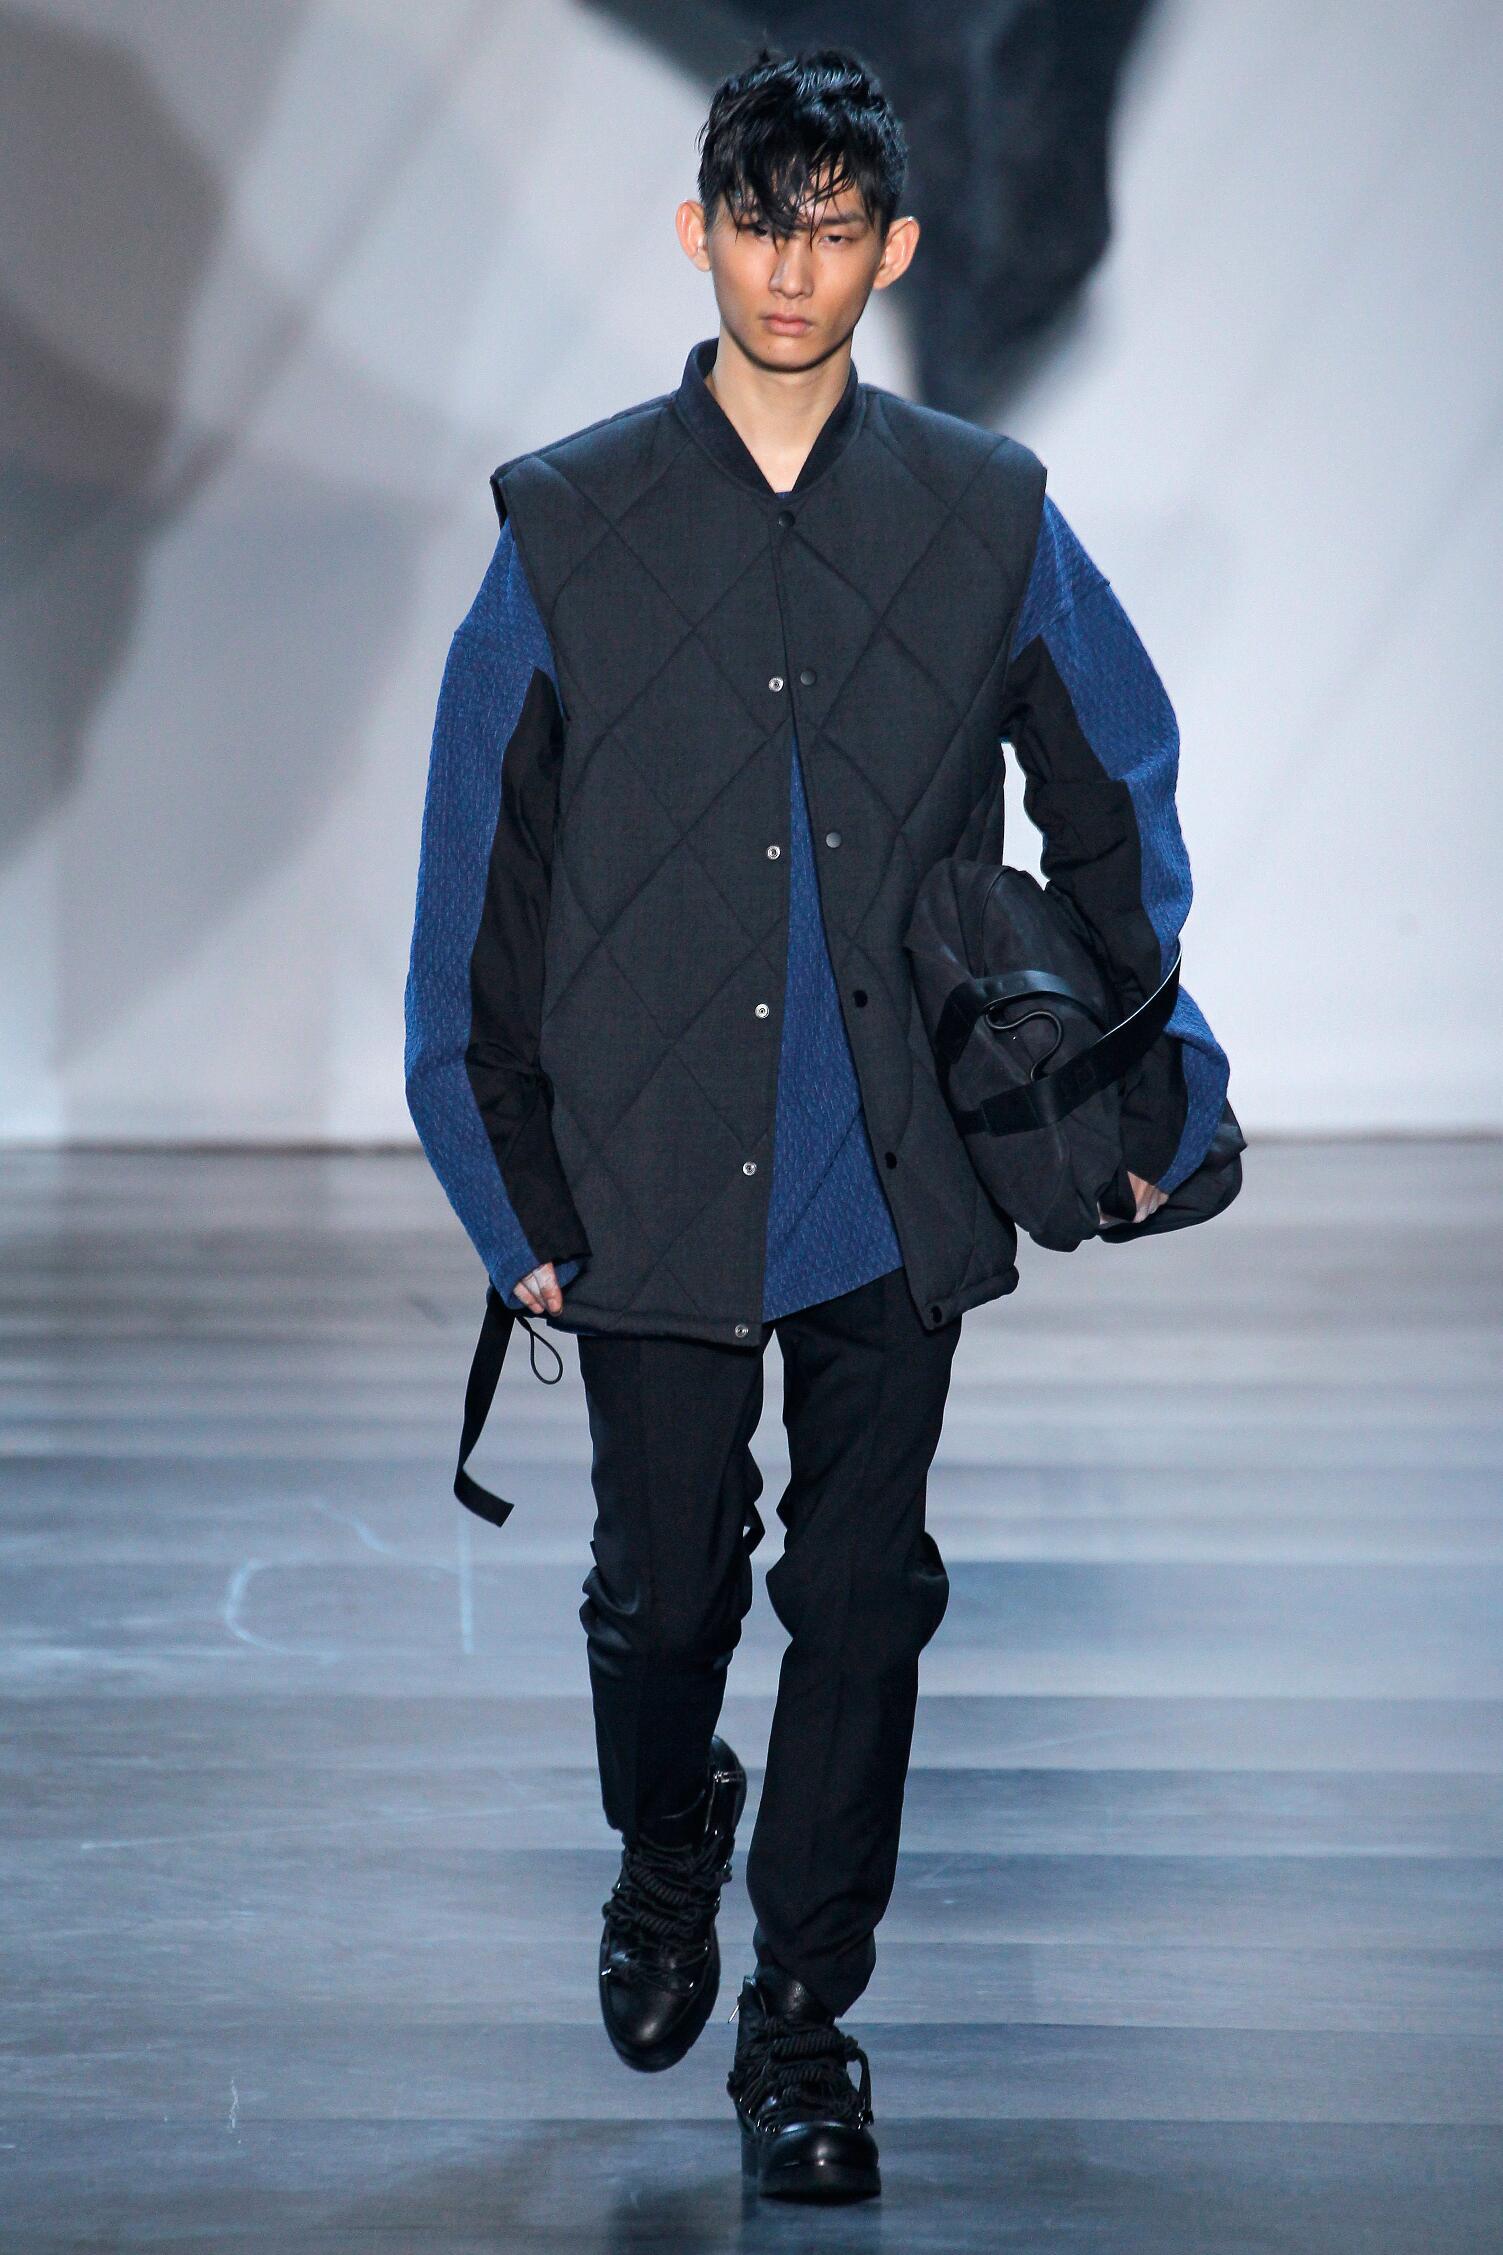 Fashion Model 3.1 Phillip Lim Collection Catwalk